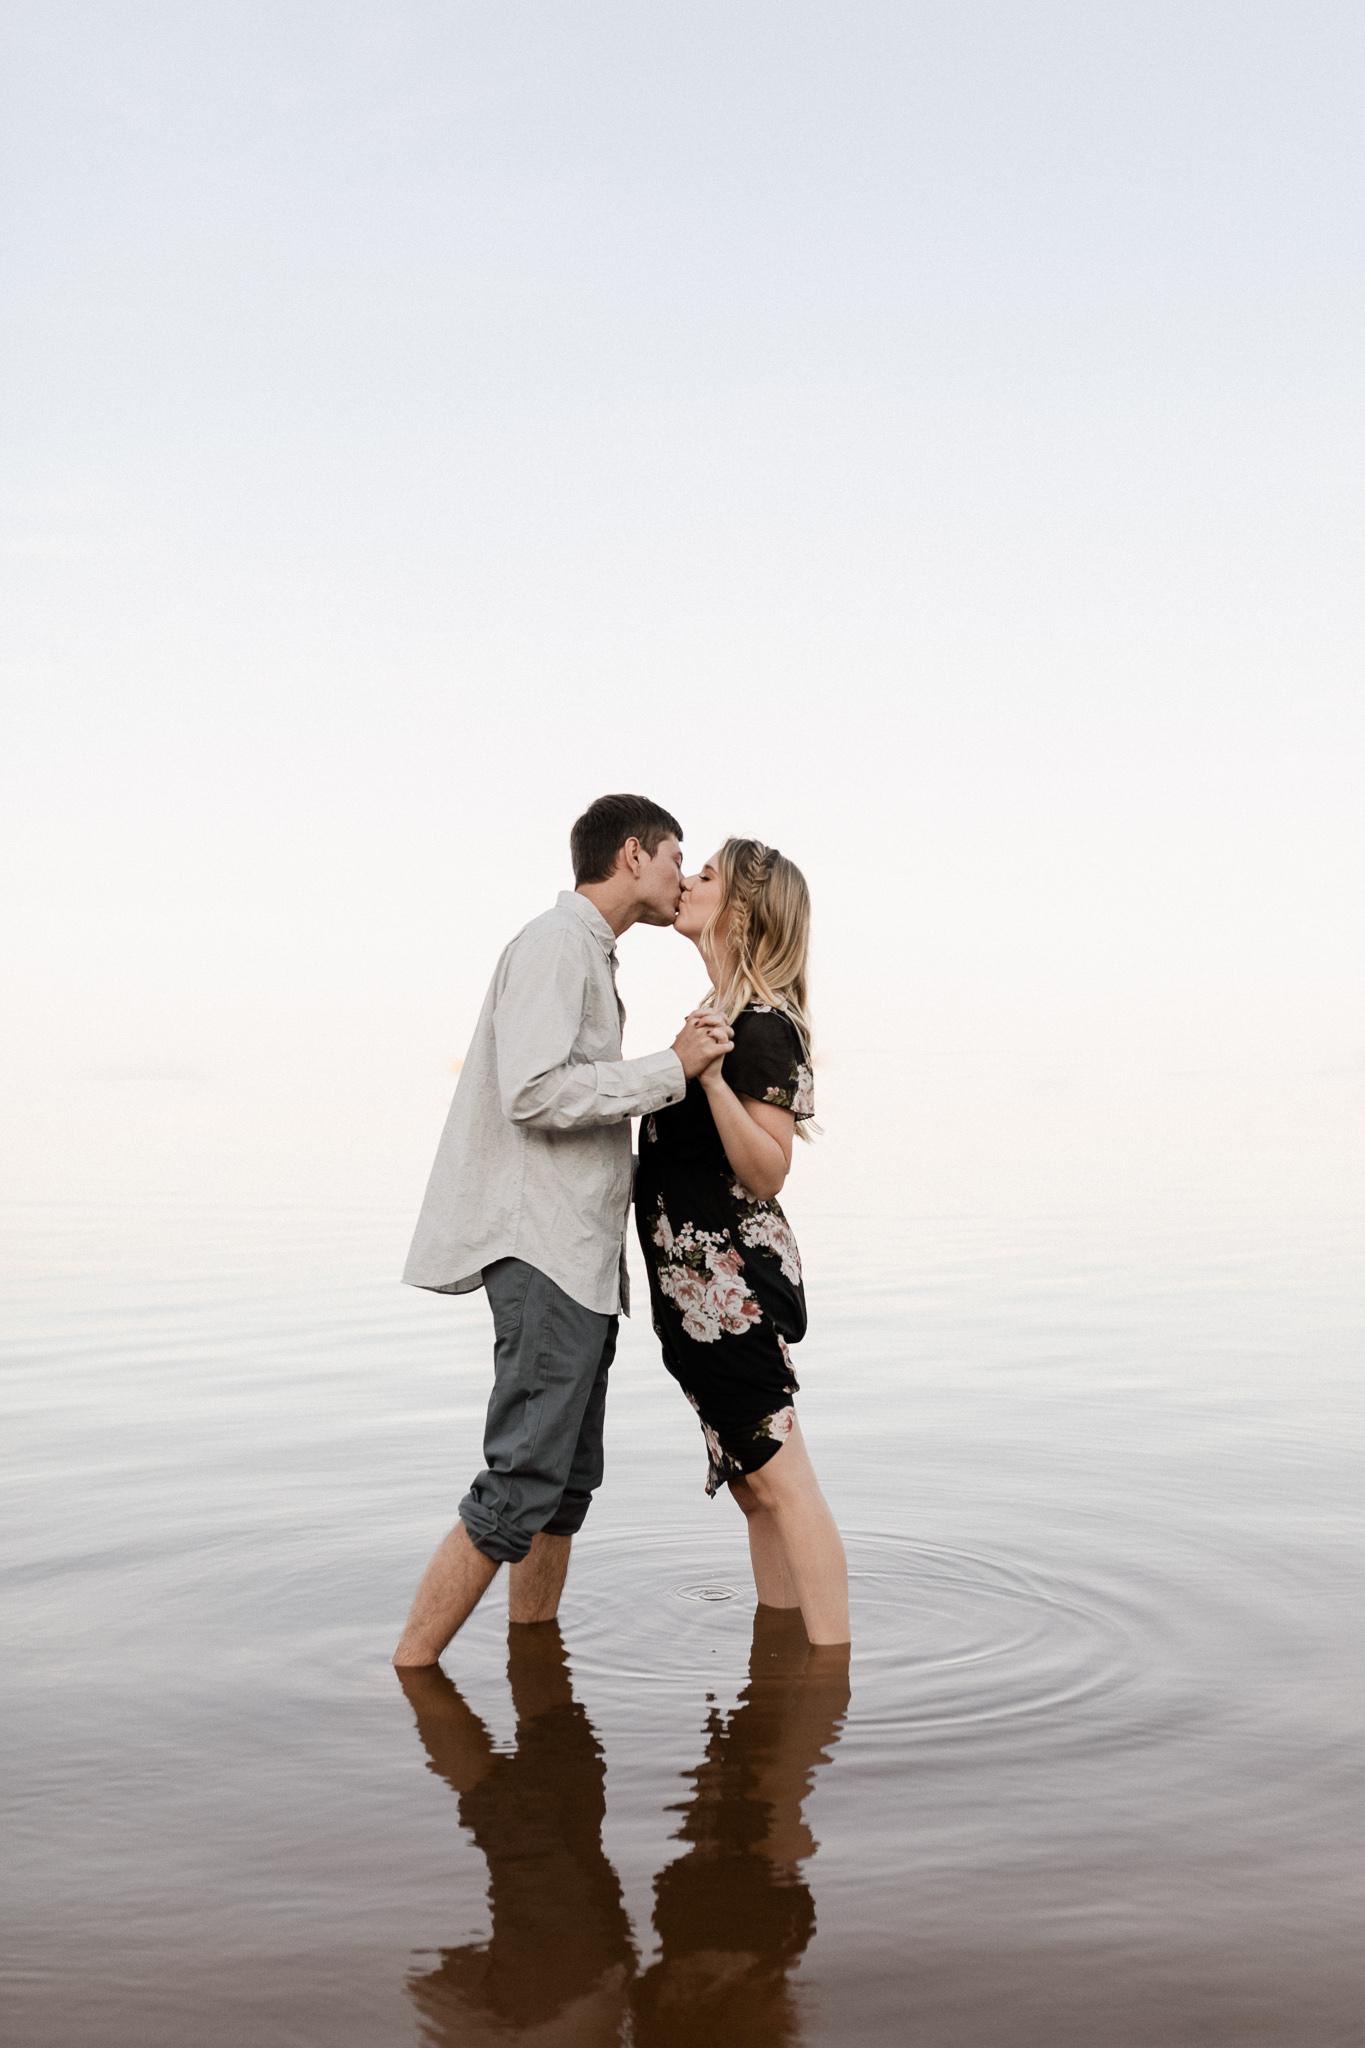 Kyle + Brittany   Fall Lake Engagement Photos   Oklahoma Lifestyle Photographer-21.jpg